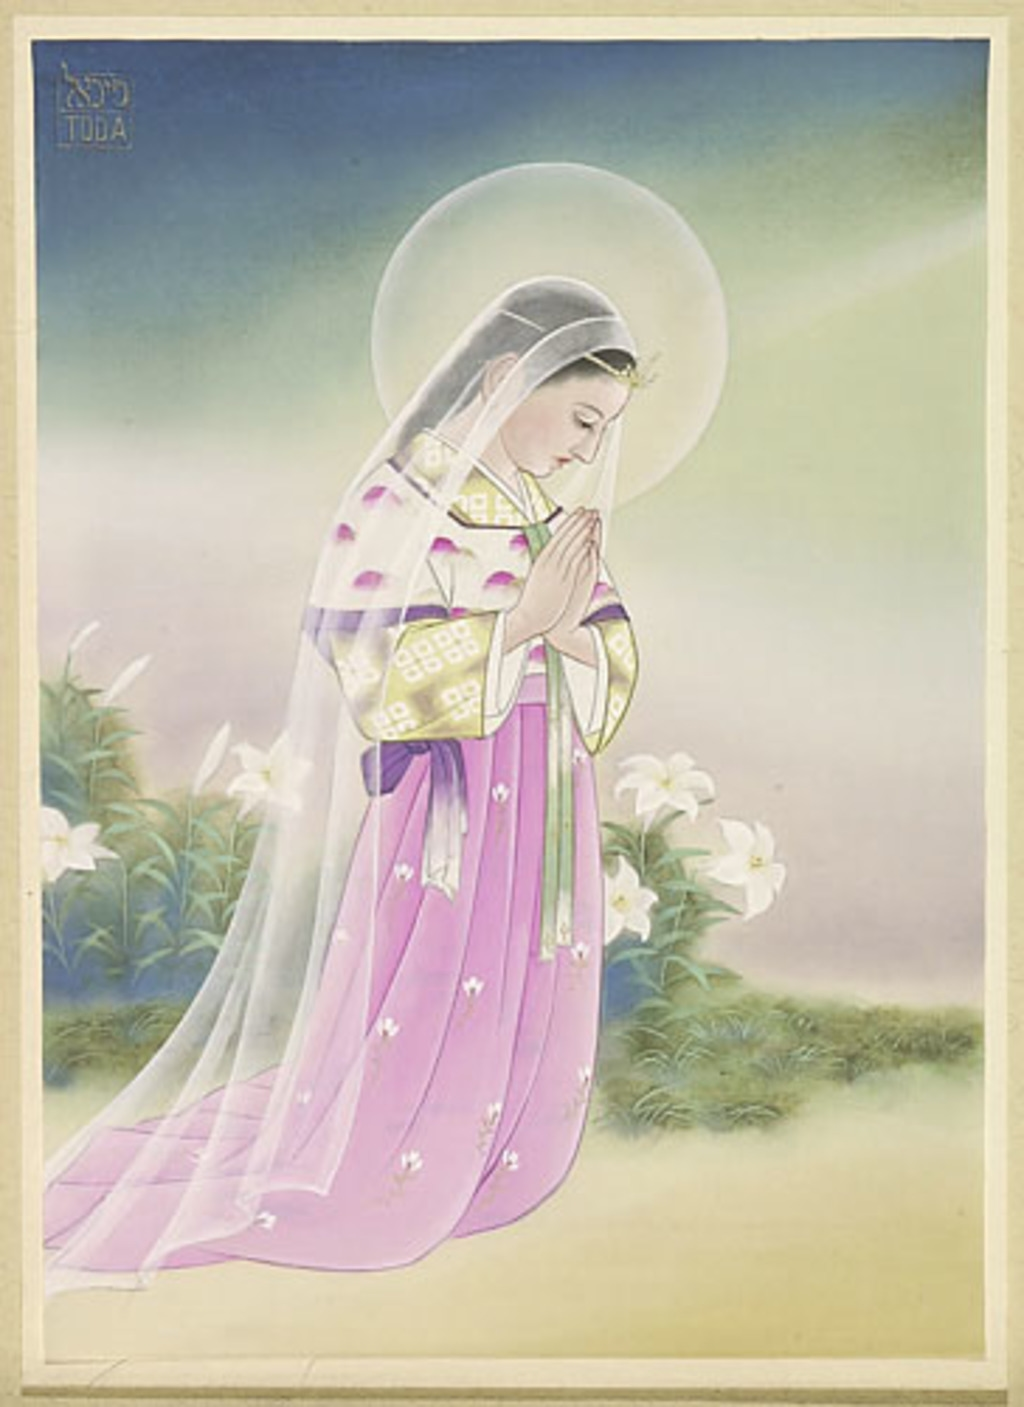 Sainte agenouillée